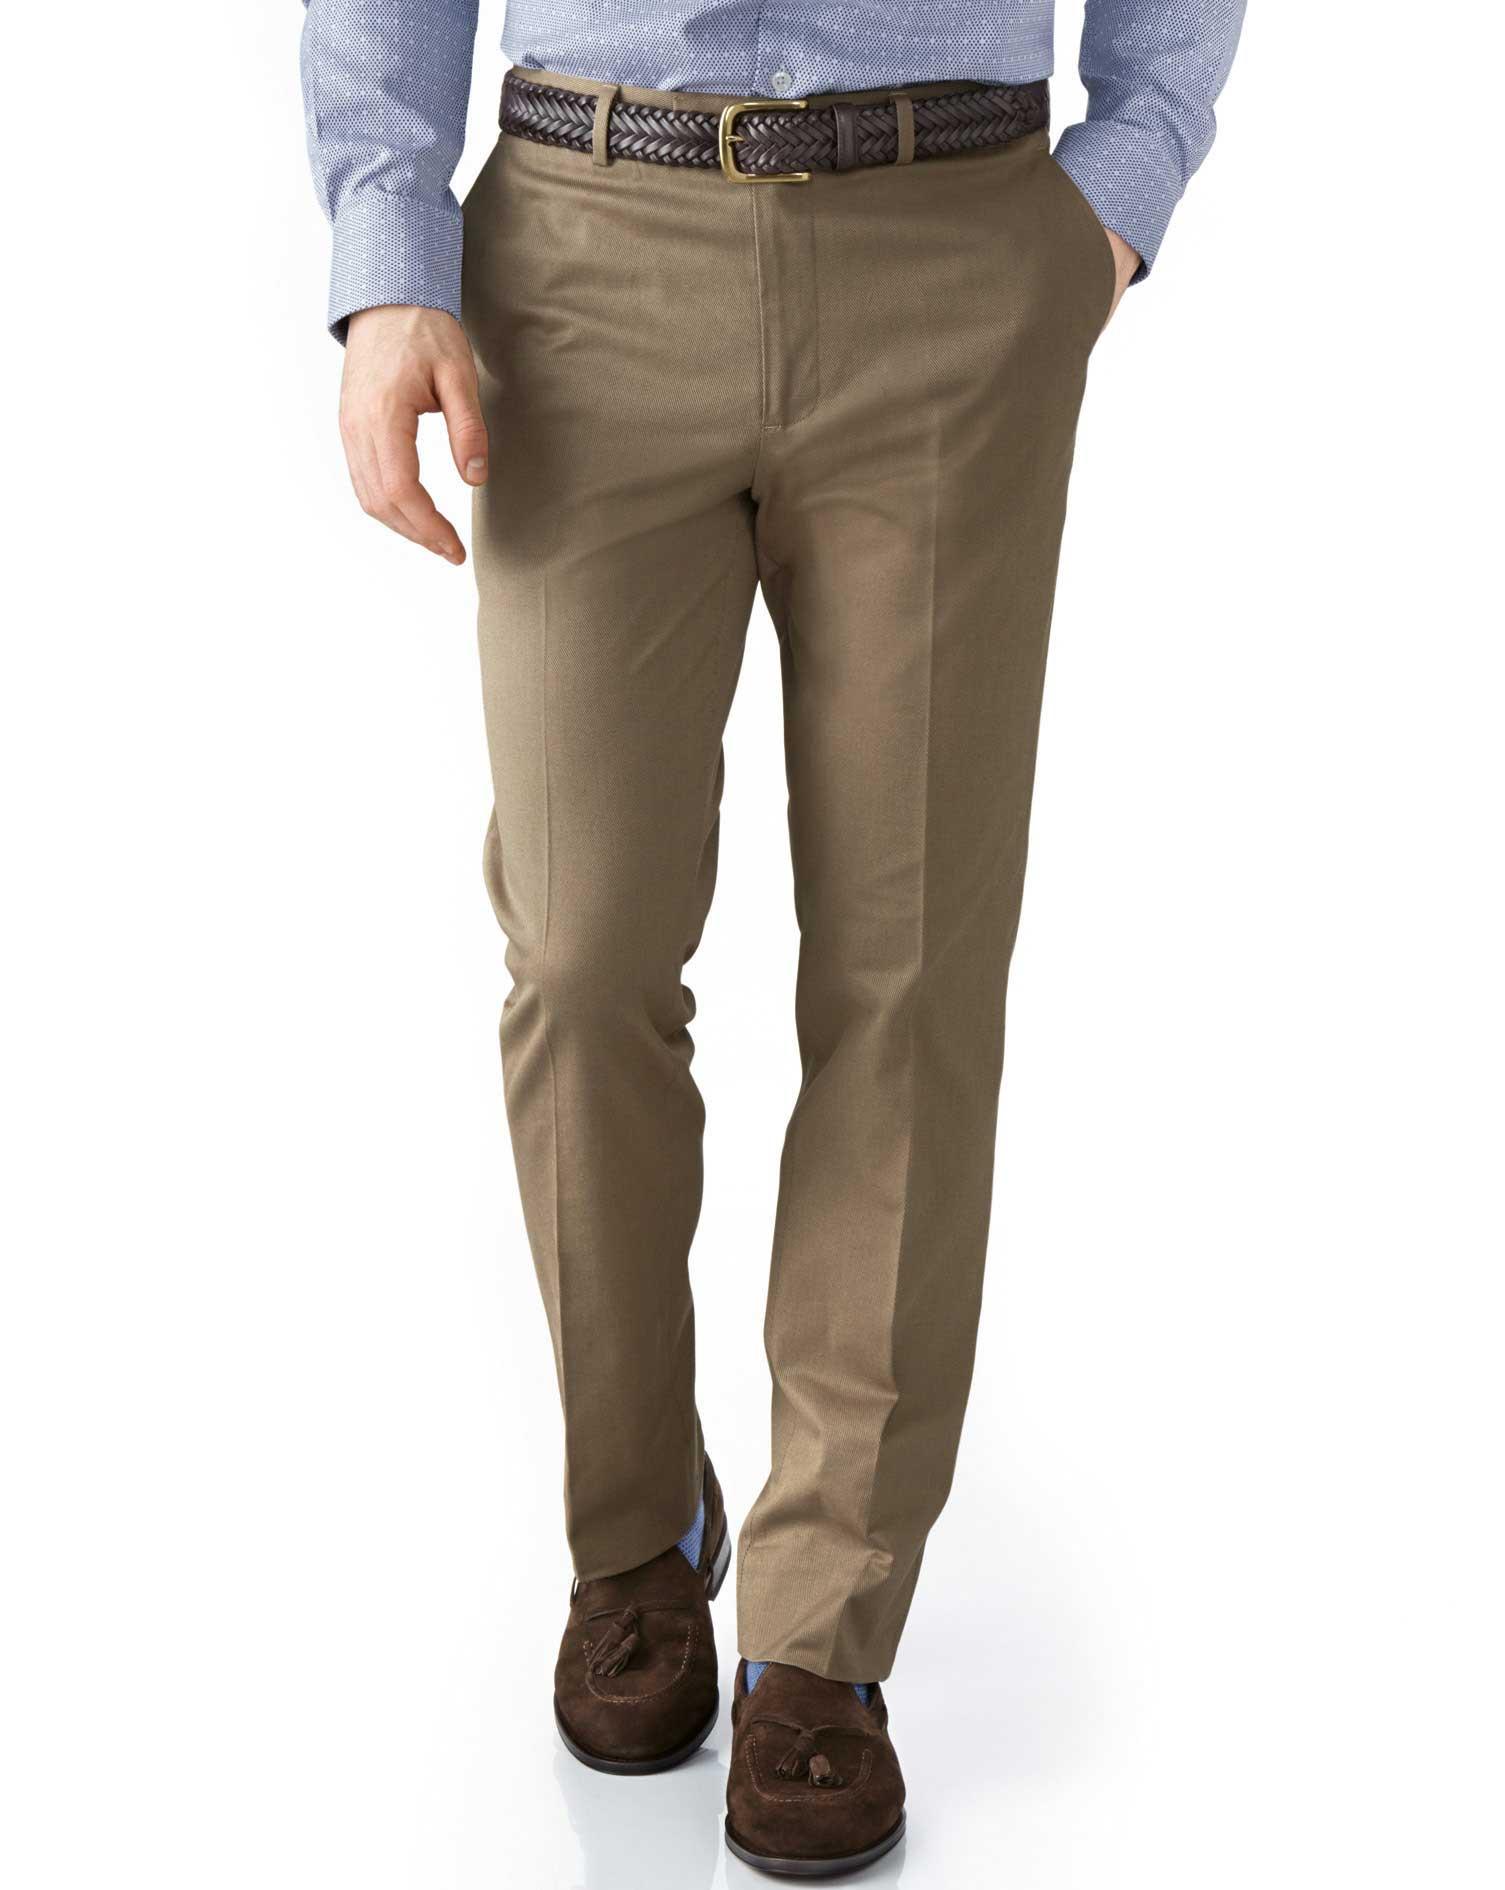 Tan Extra Slim Fit Stretch Cavalry Twill Trousers Size W34 L32 by Charles Tyrwhitt